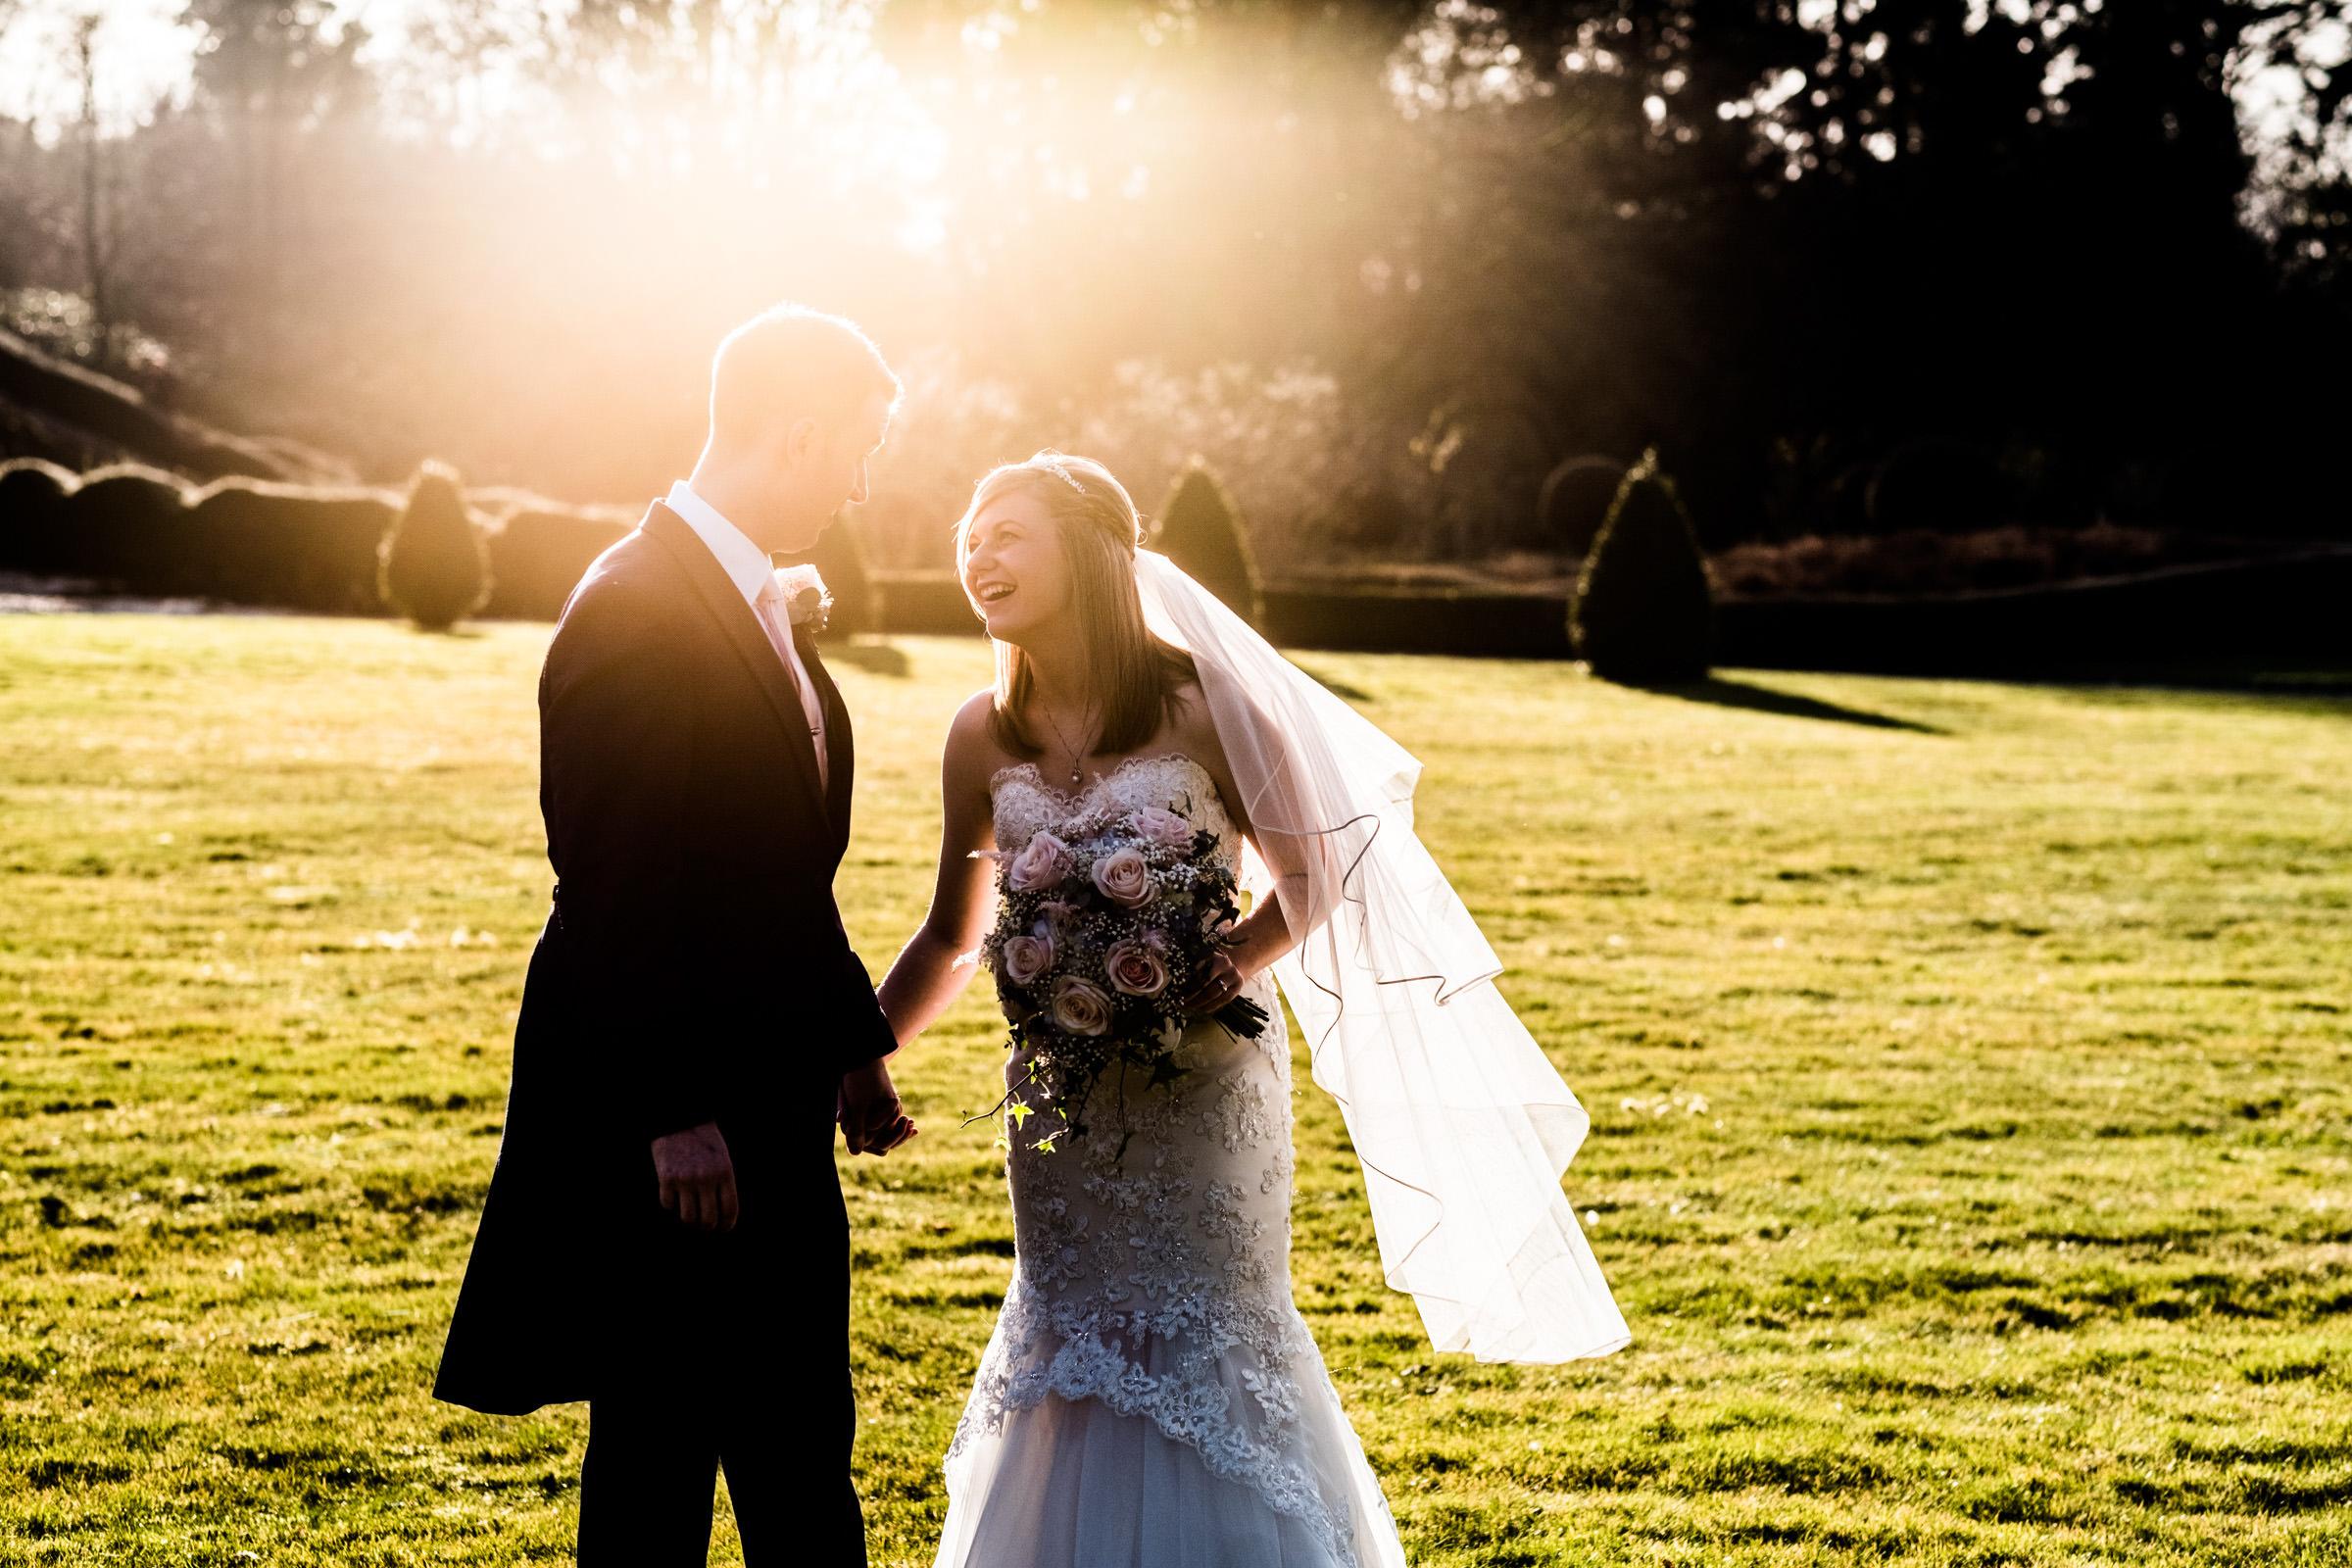 Donna & Nick's Wedding at Wotton House in Dorking 020.jpg